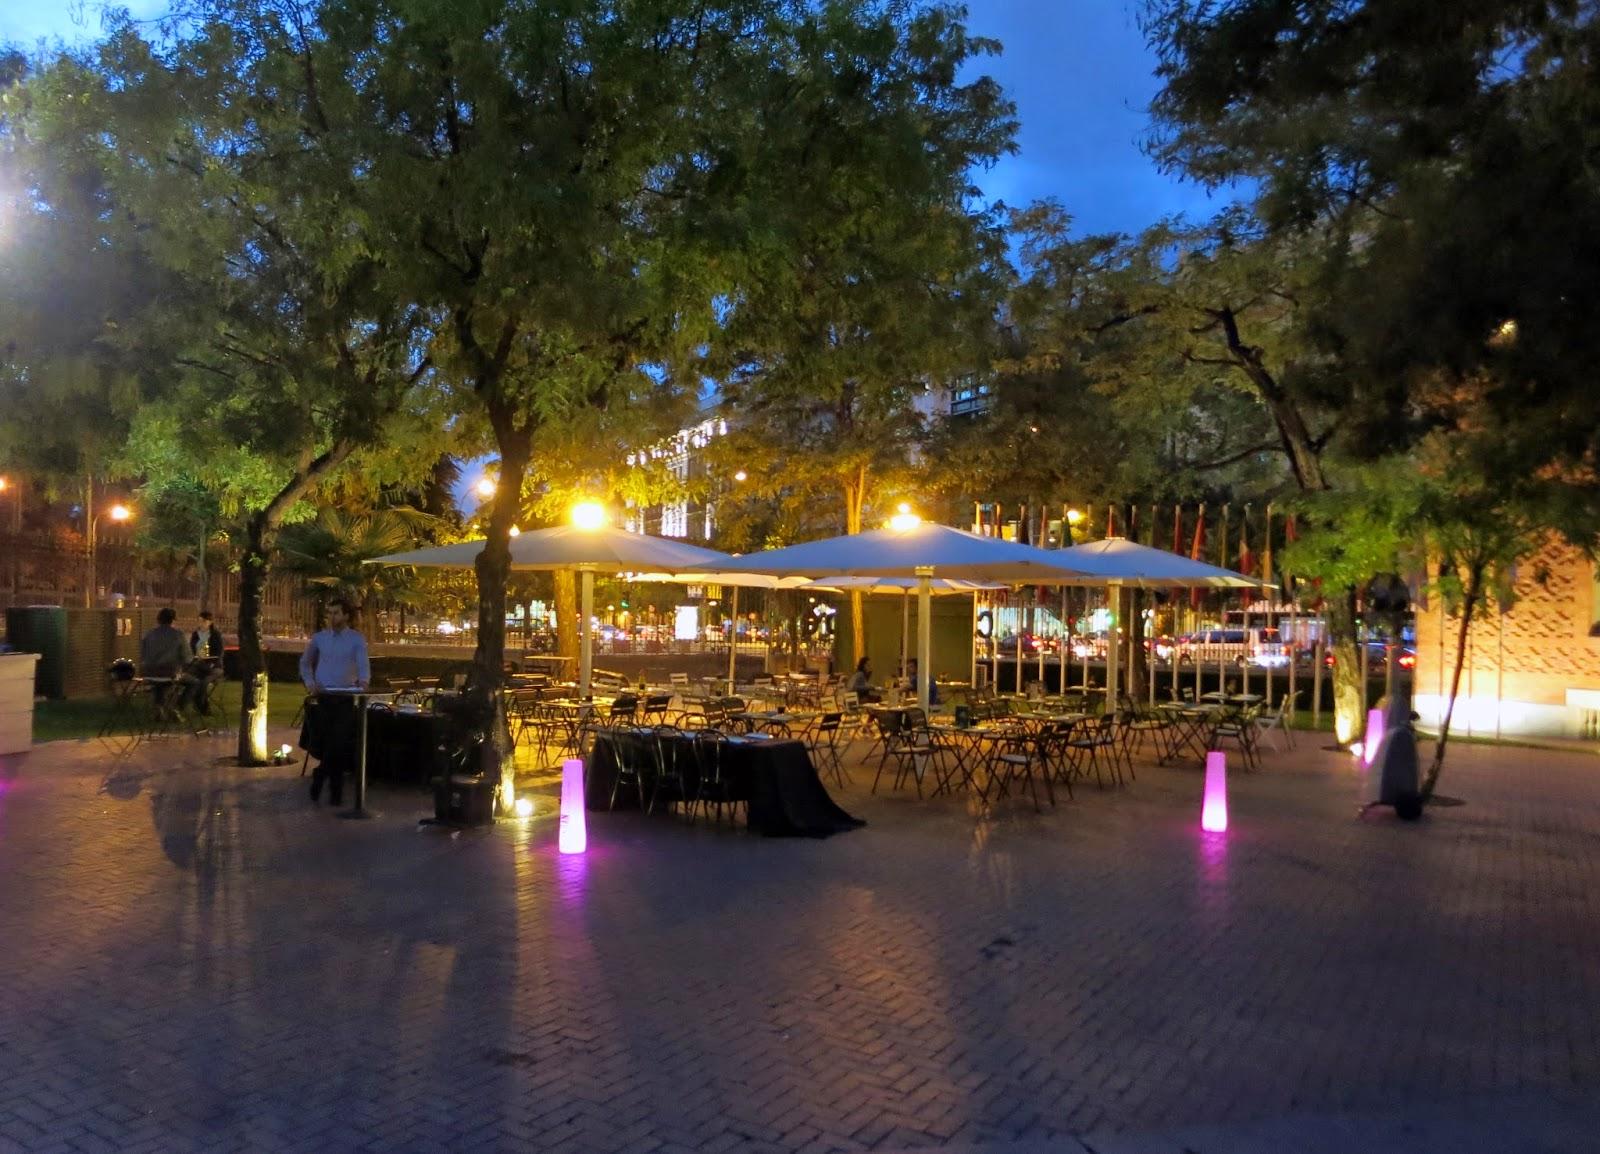 Garitos de madrid tapas bares restaurantes y discos - Casa arabe madrid restaurante ...